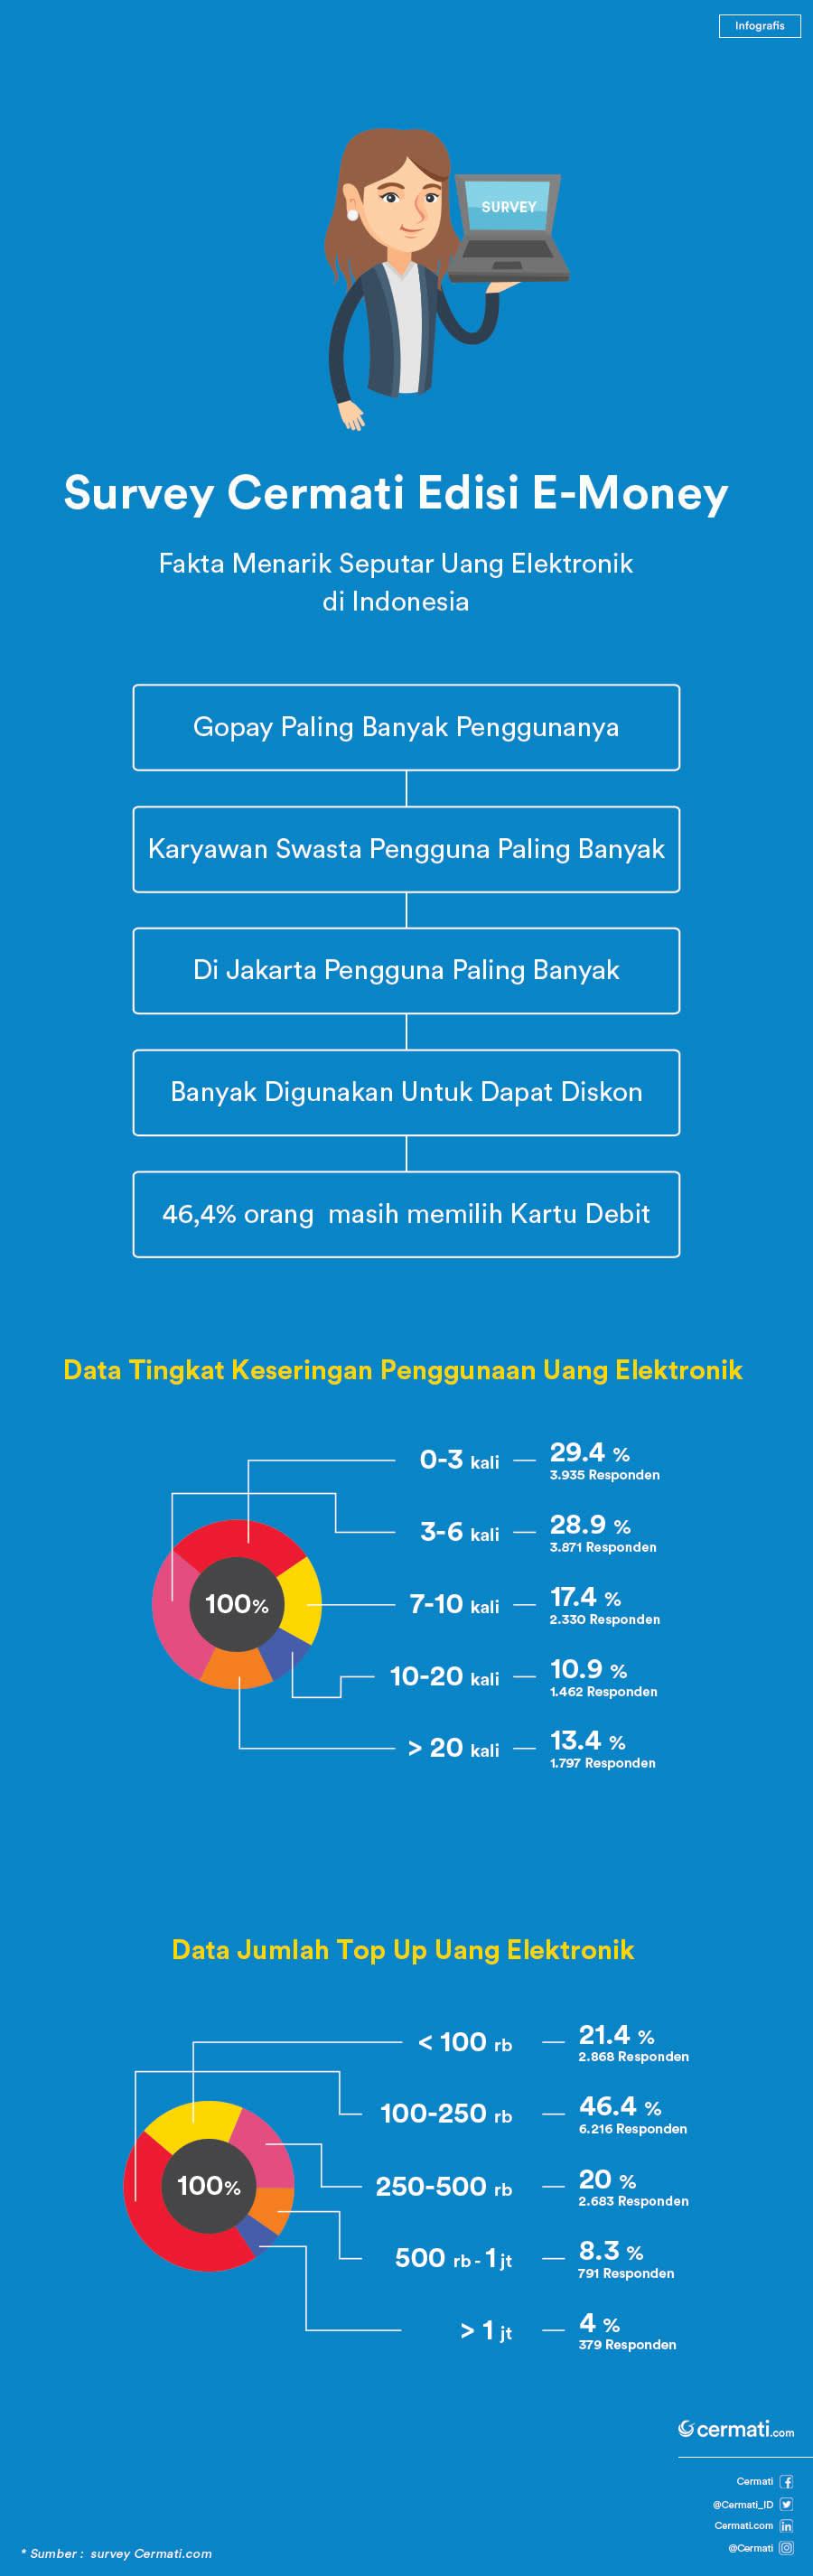 infografis e-money 2